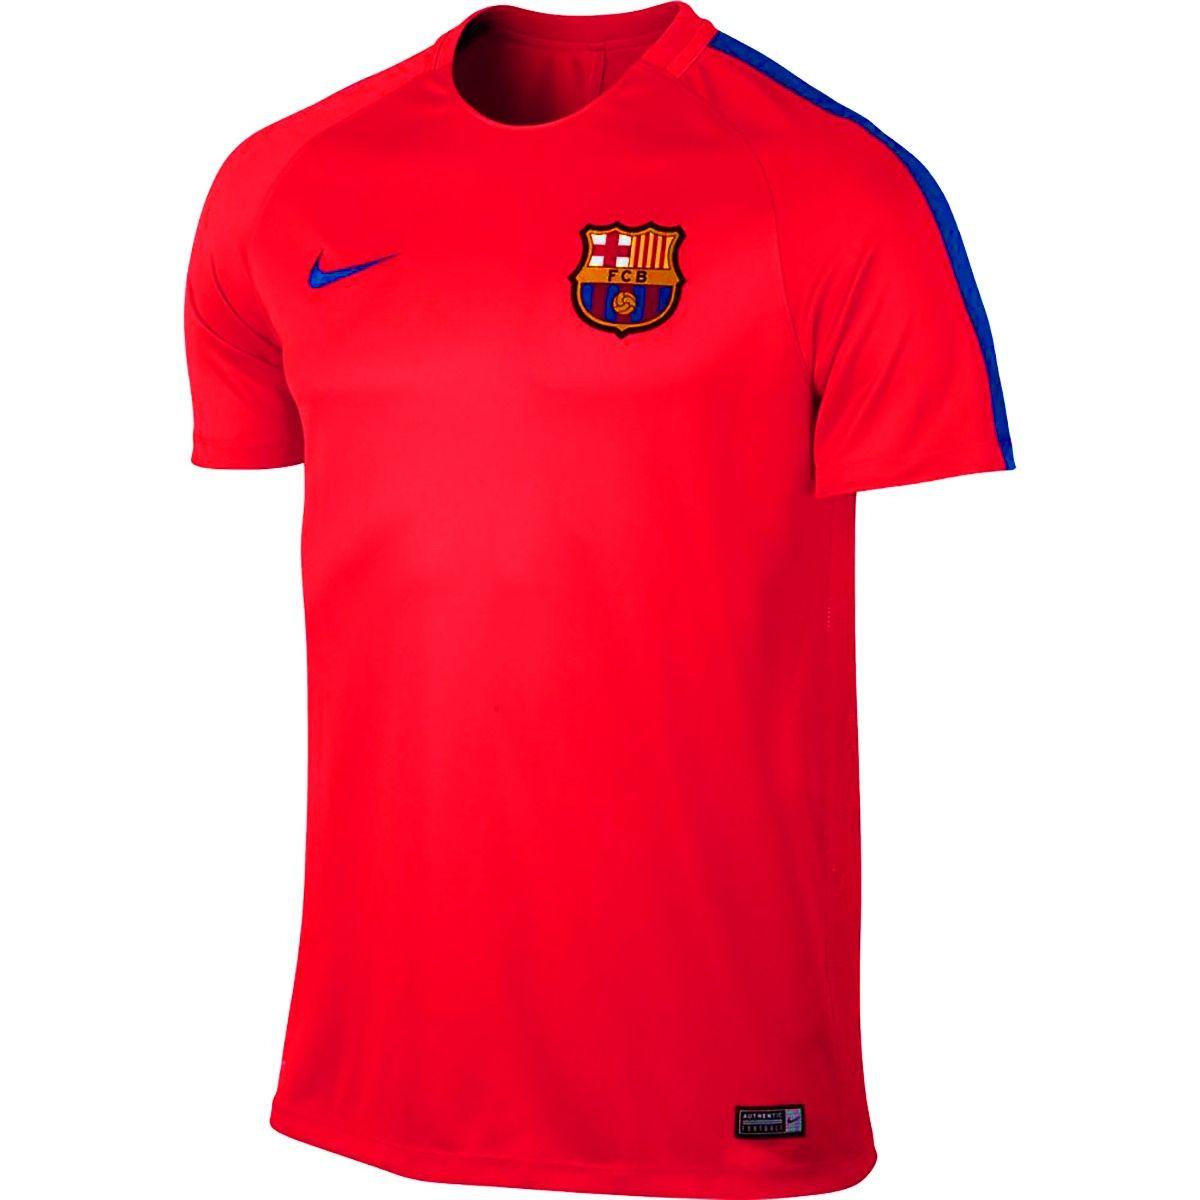 d6d79262cc1 Type Shirts Nike FC Barcelona Training Tee